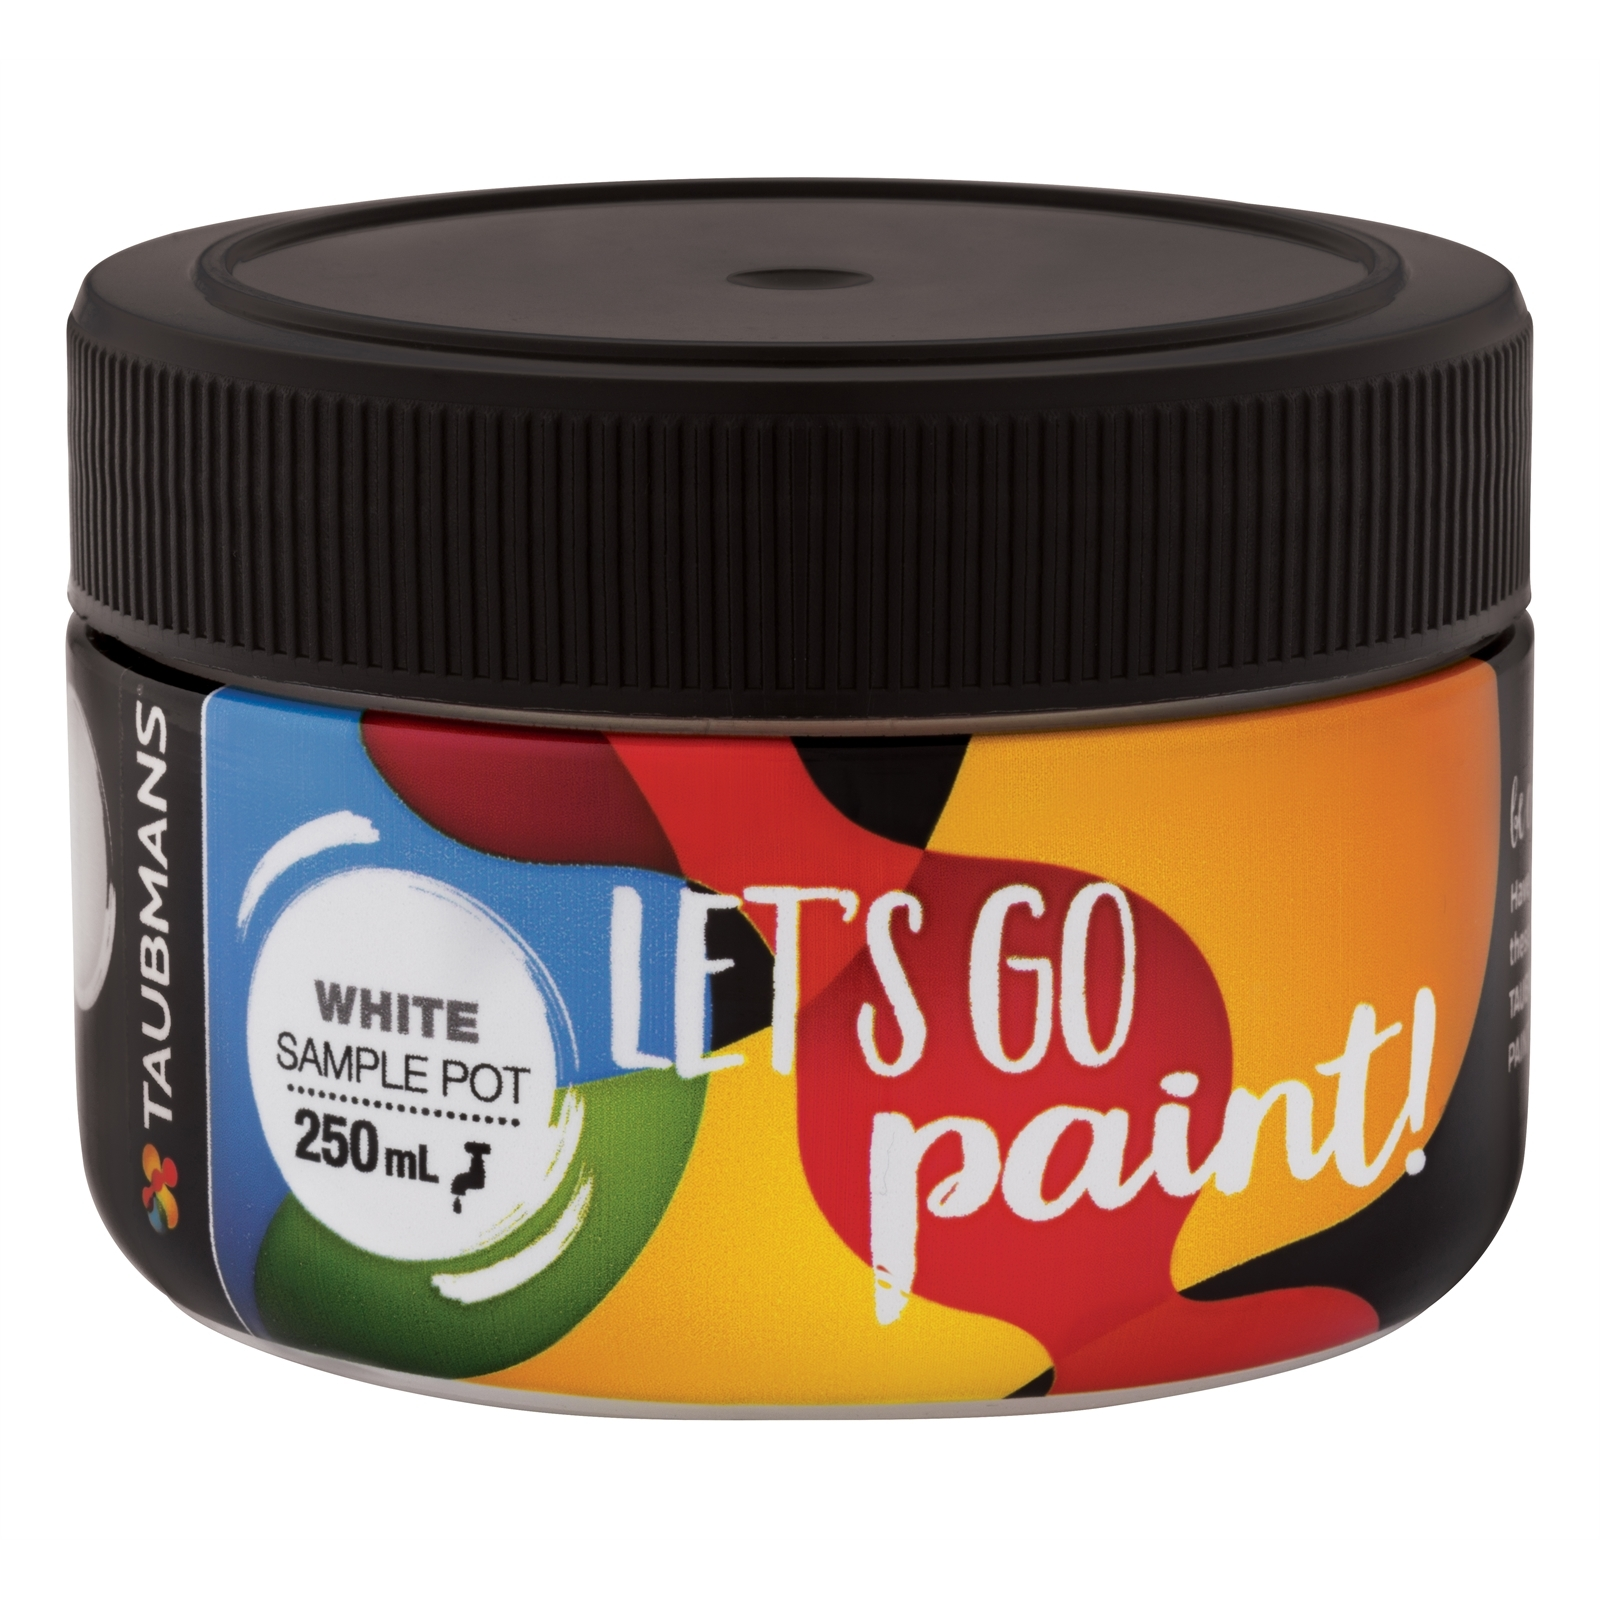 Taubmans 250ml Sample Pot White